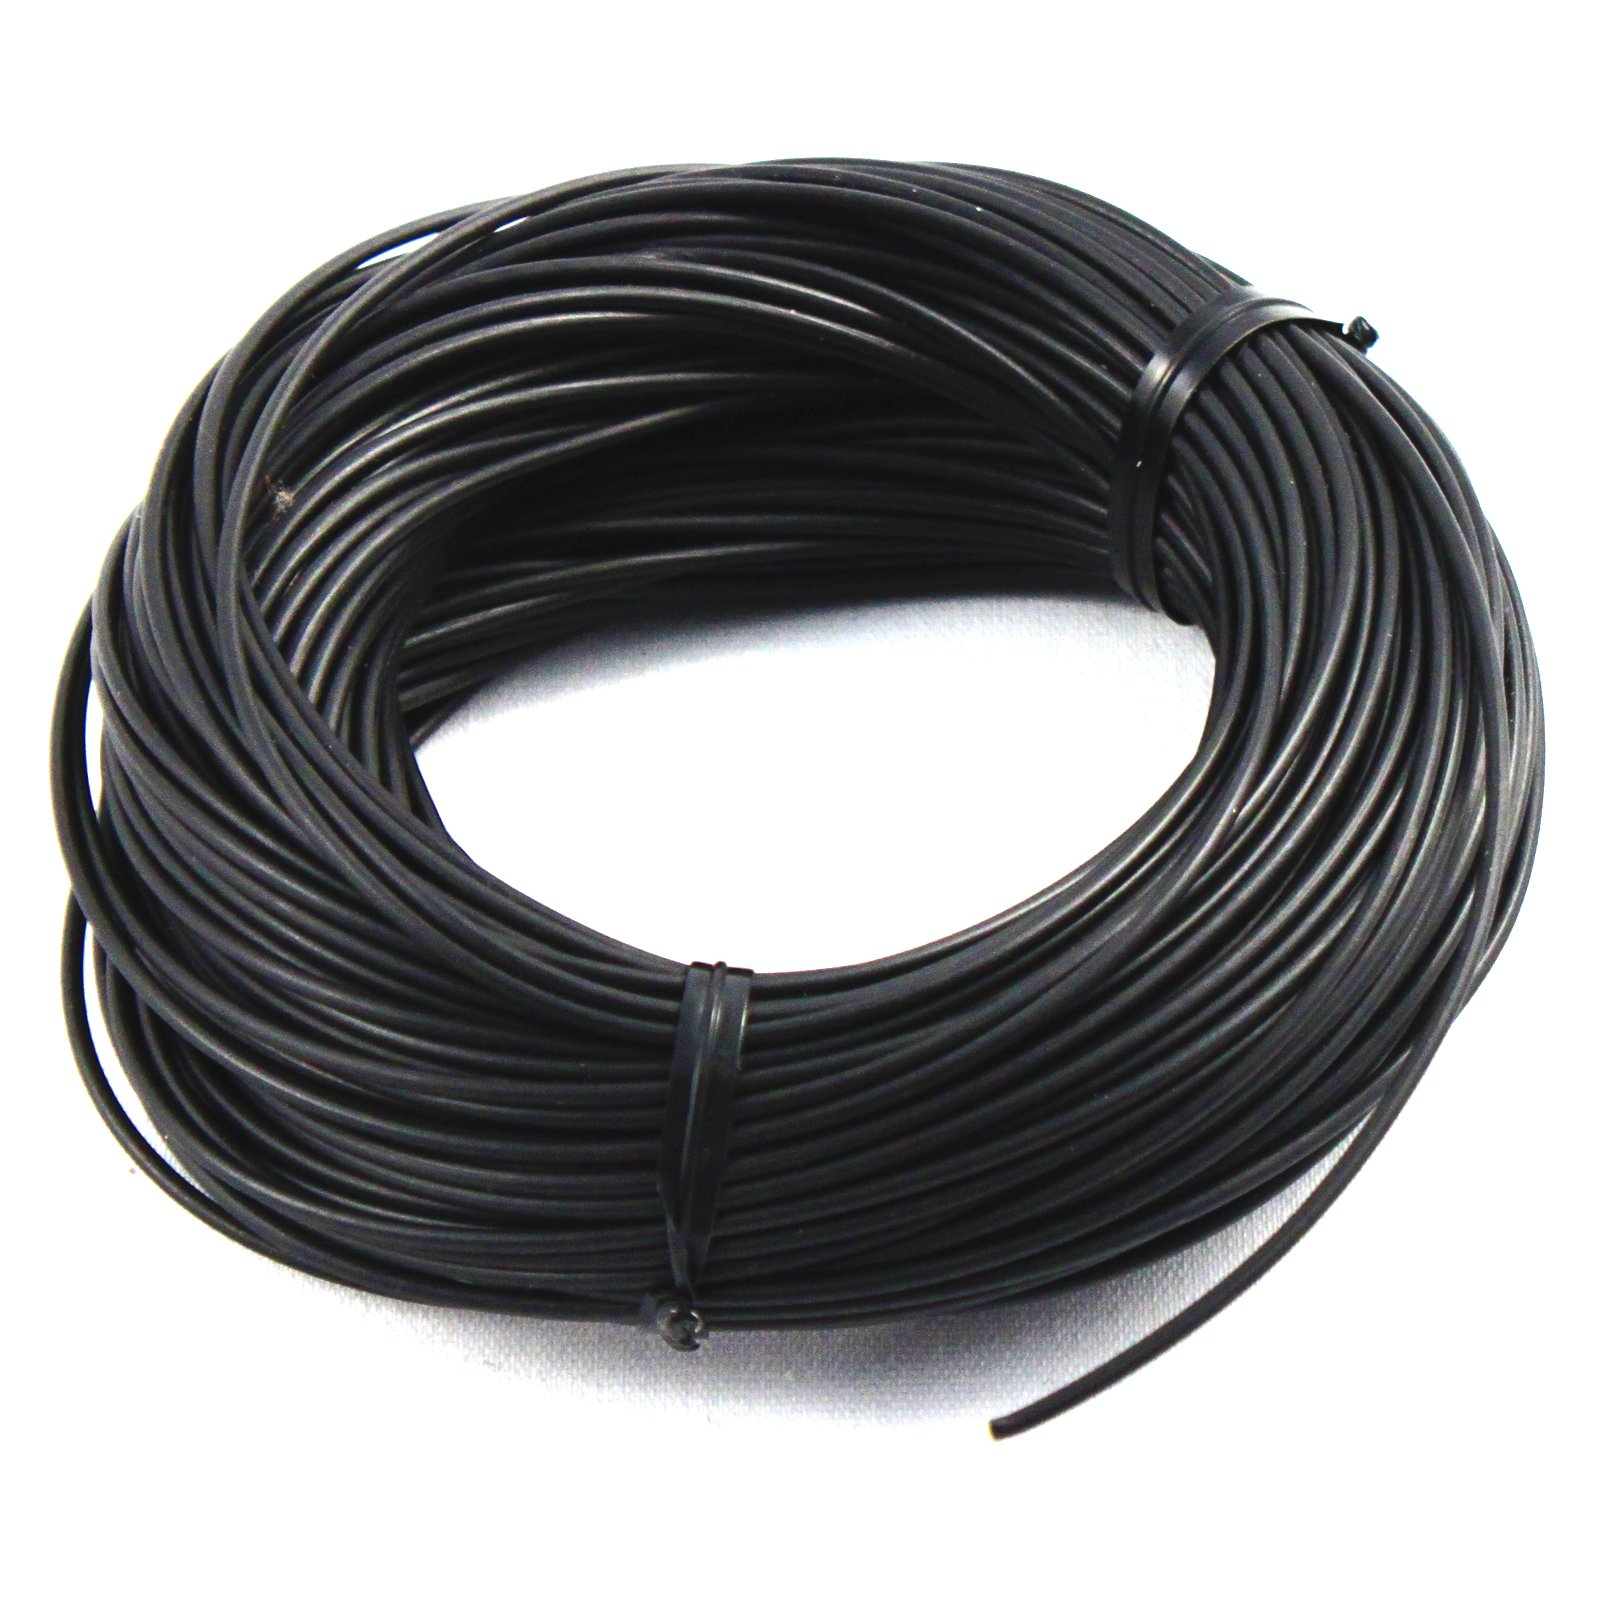 ASR Outdoor Kevlar Sport Line Utility Cord (Multiple Lengths, Colors)